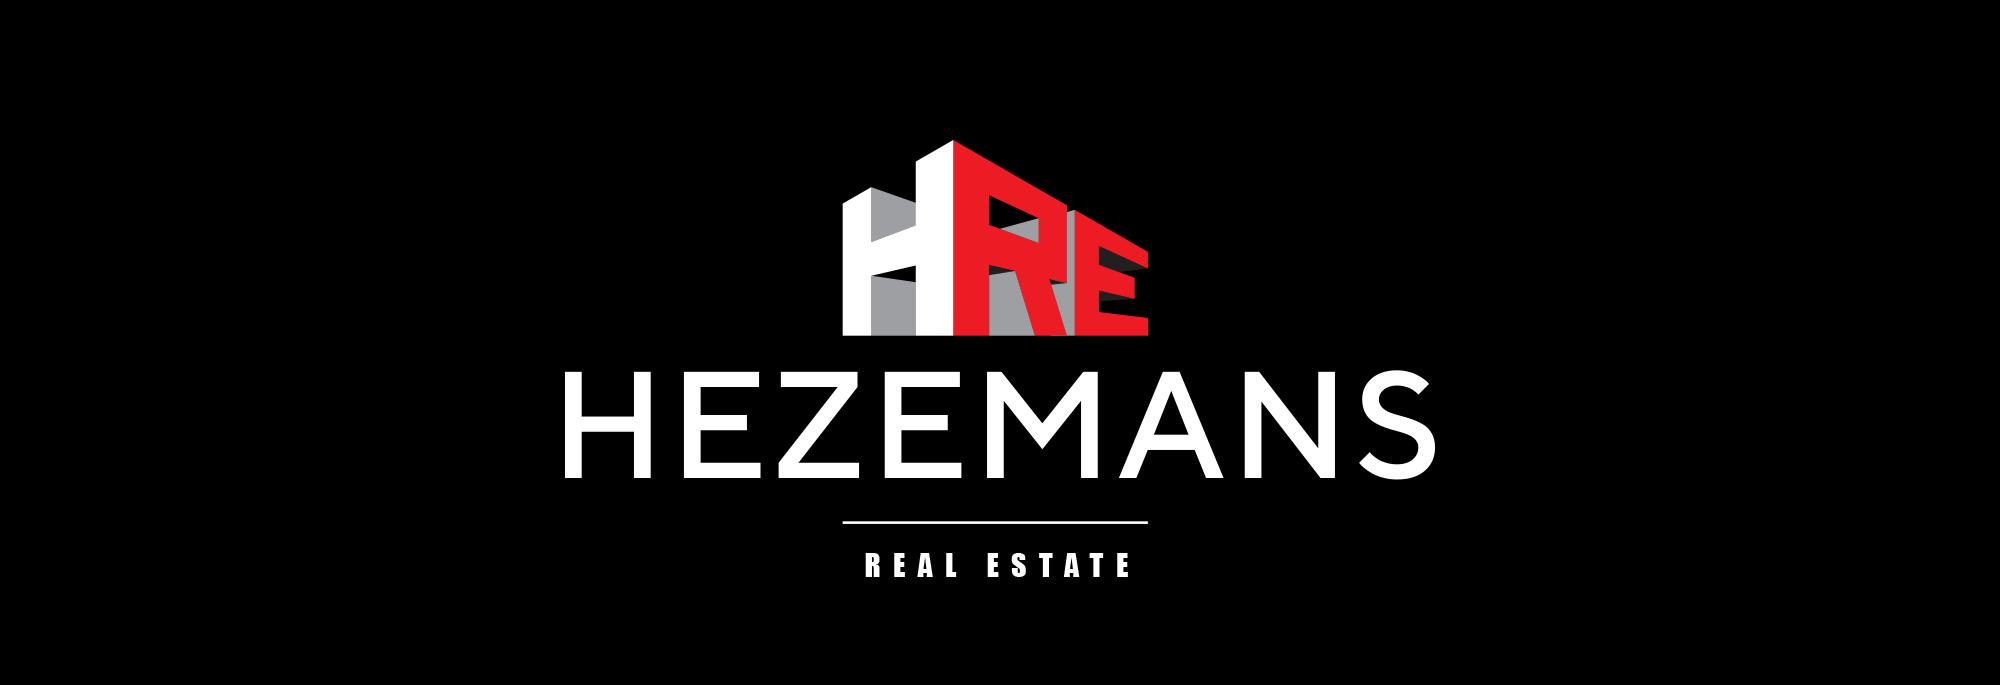 Hezemans-Real-Estate-logo